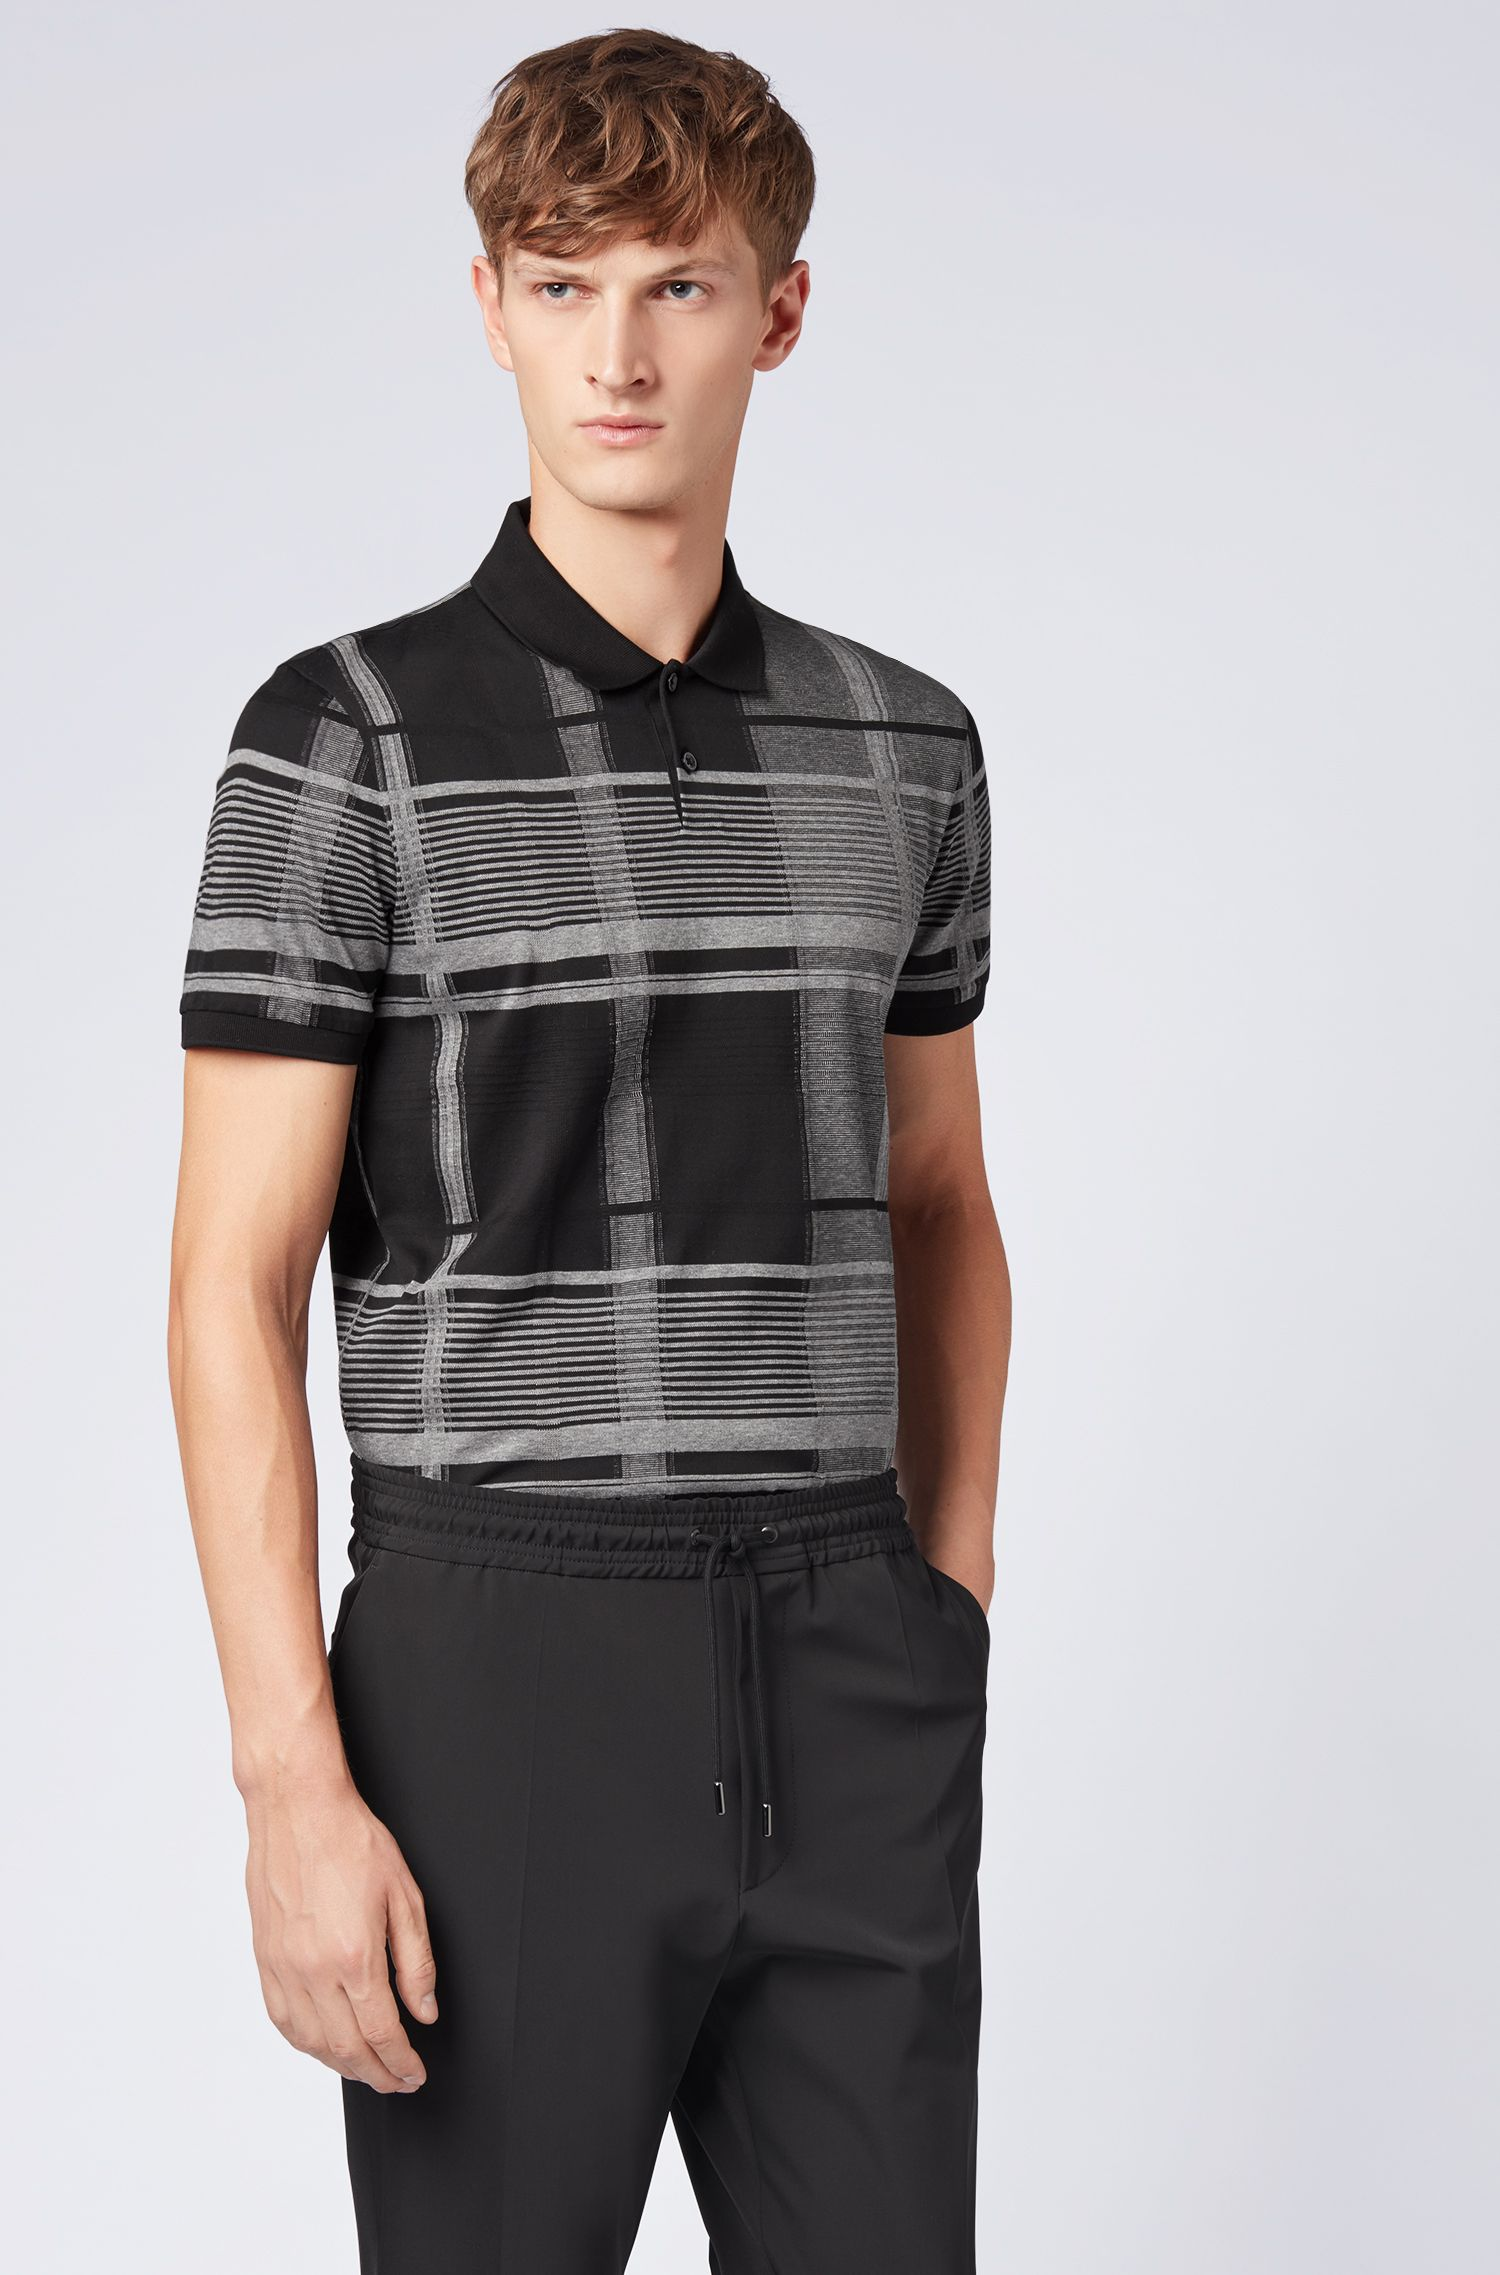 Windowpane check polo shirt in mercerized-cotton fil-coupé intarsia, Black